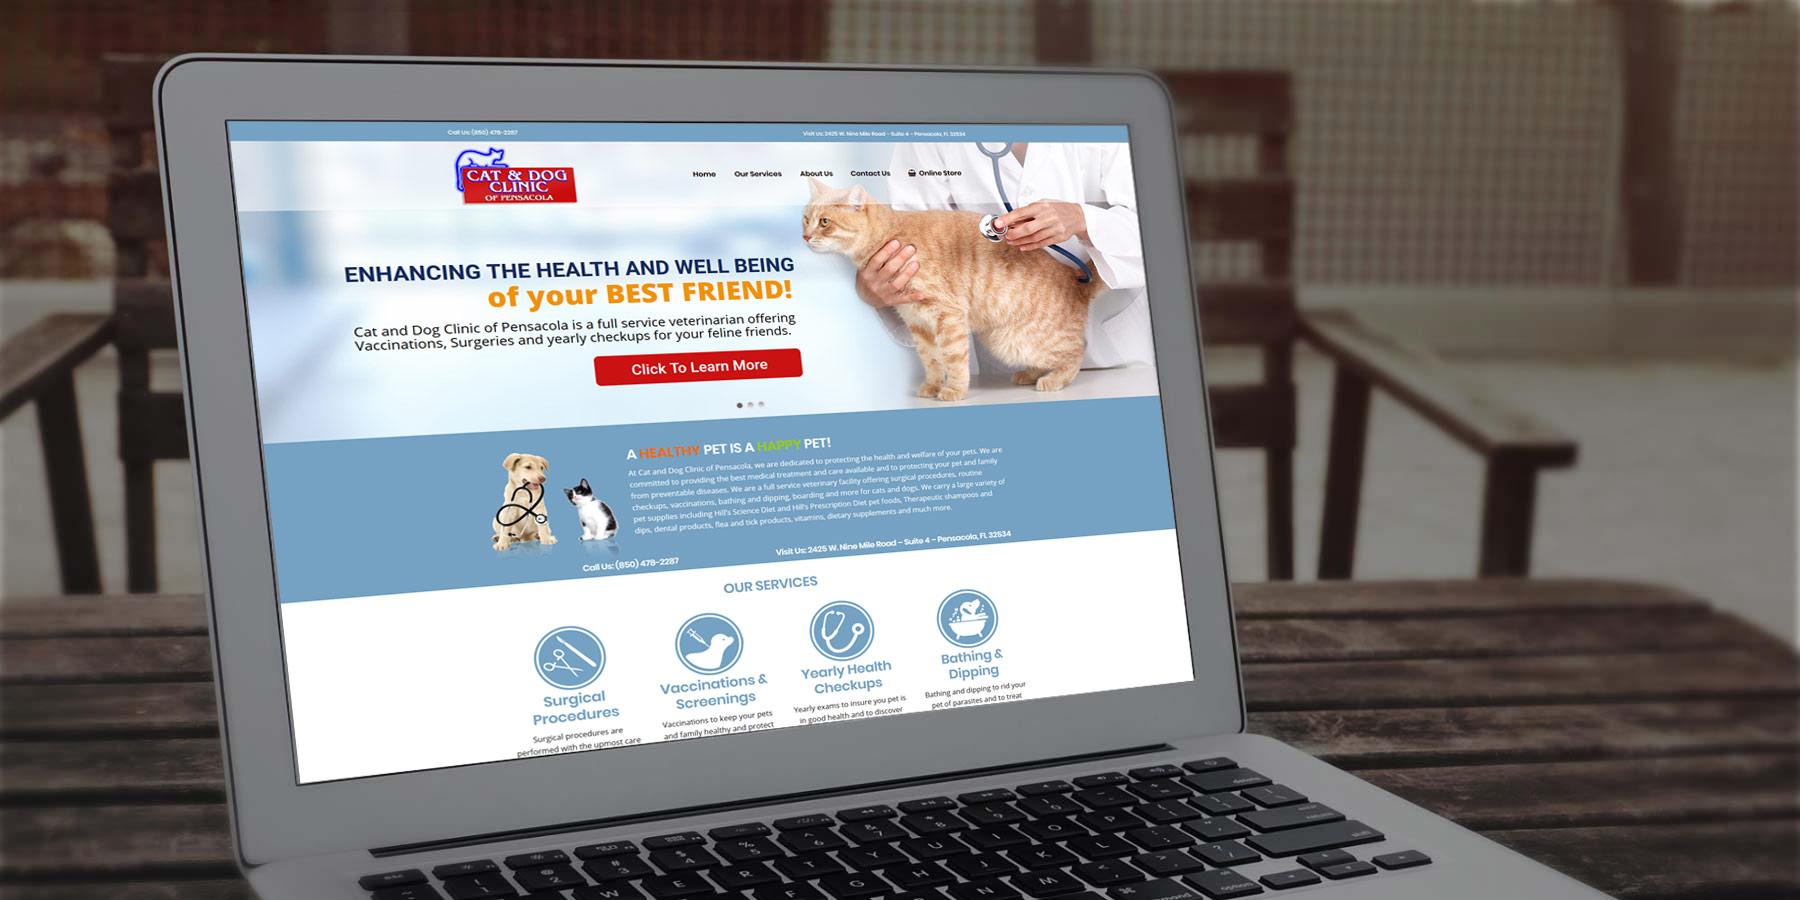 catanddogclinic